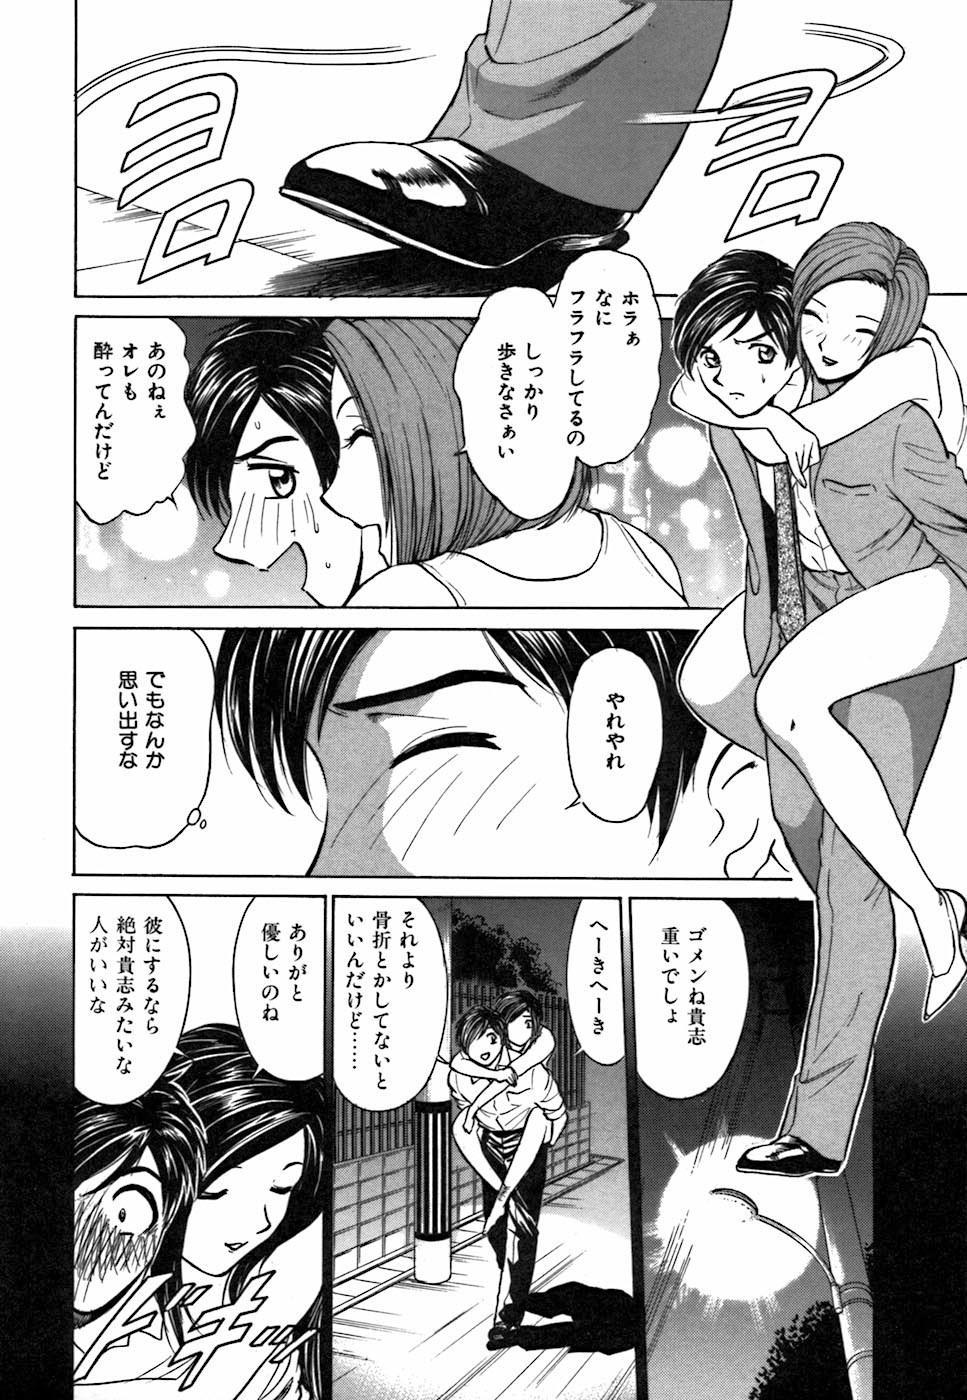 Kimi ga Nozomu Katachi | Appearance for which you hope 147